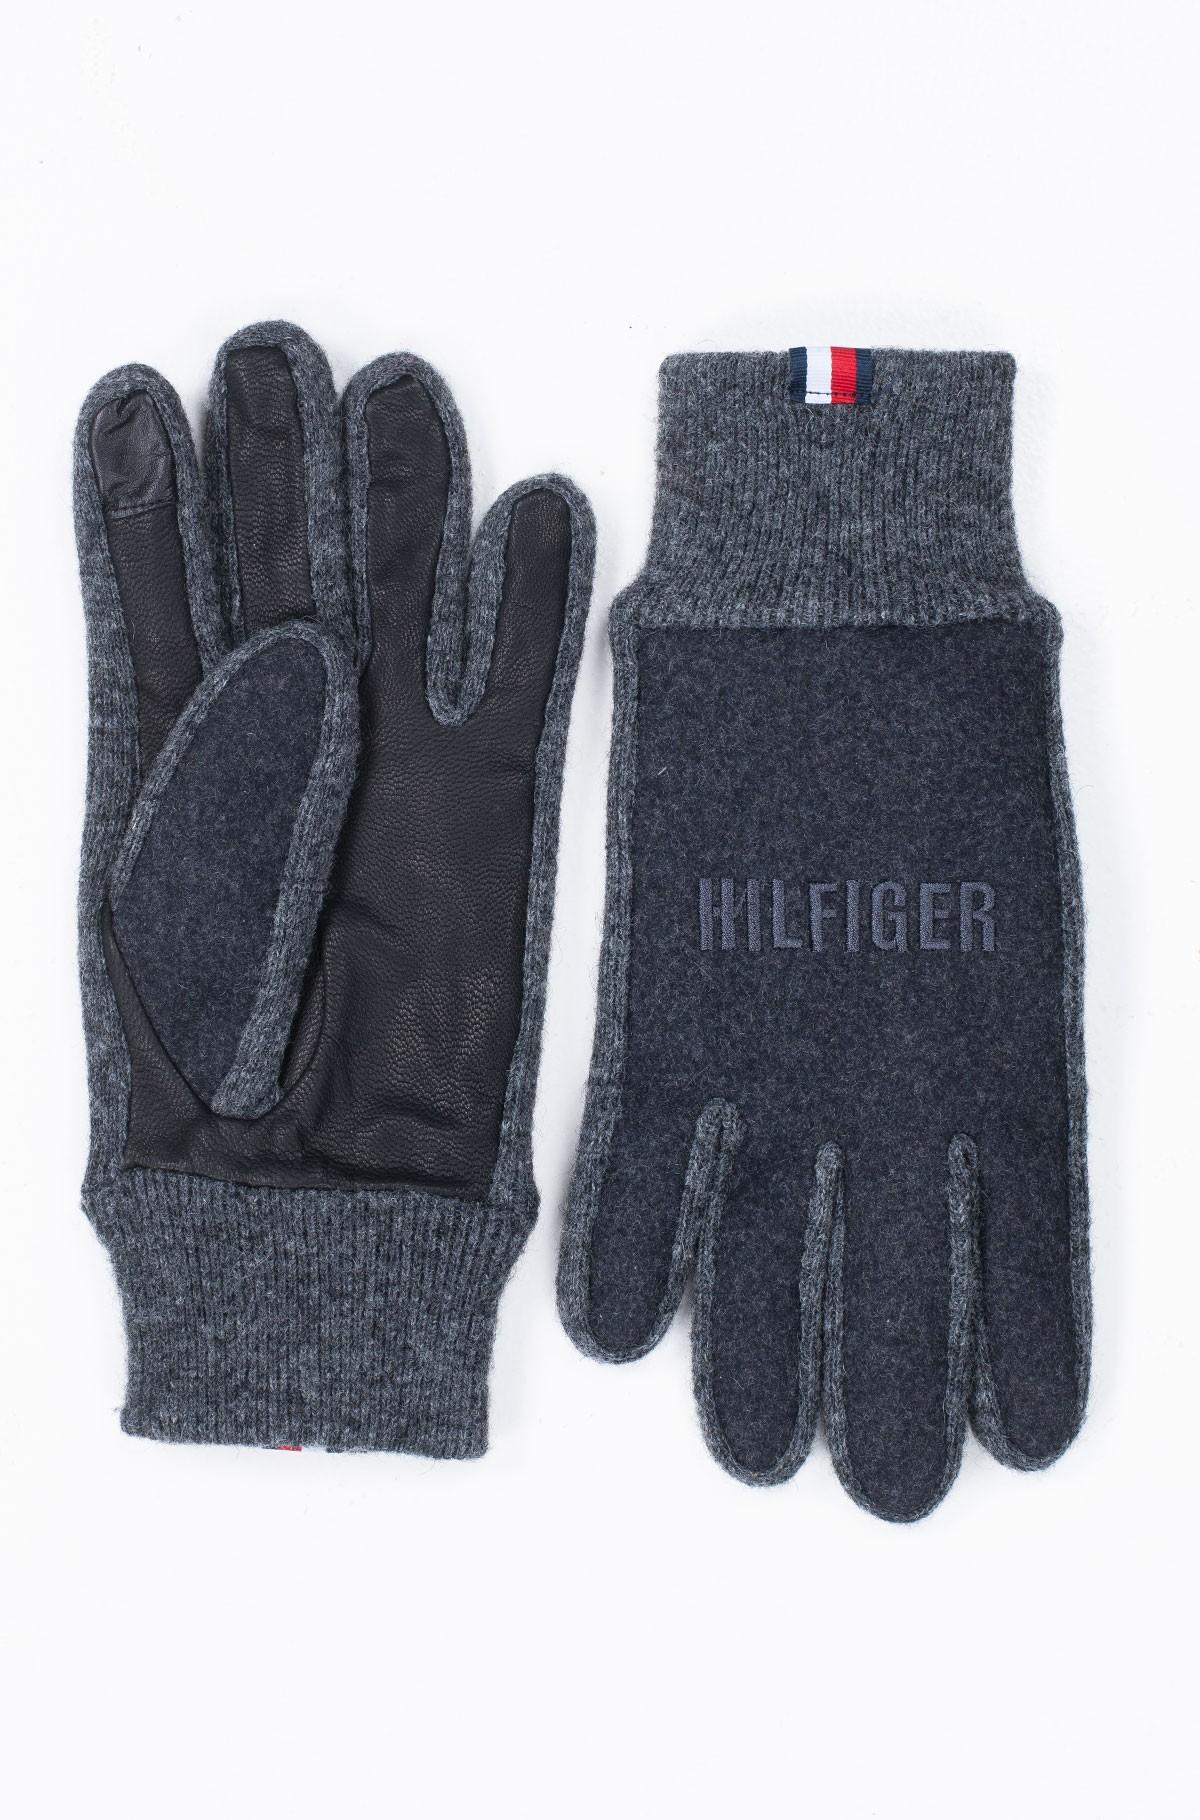 Pirštinės HILFIGER GLOVES-full-1